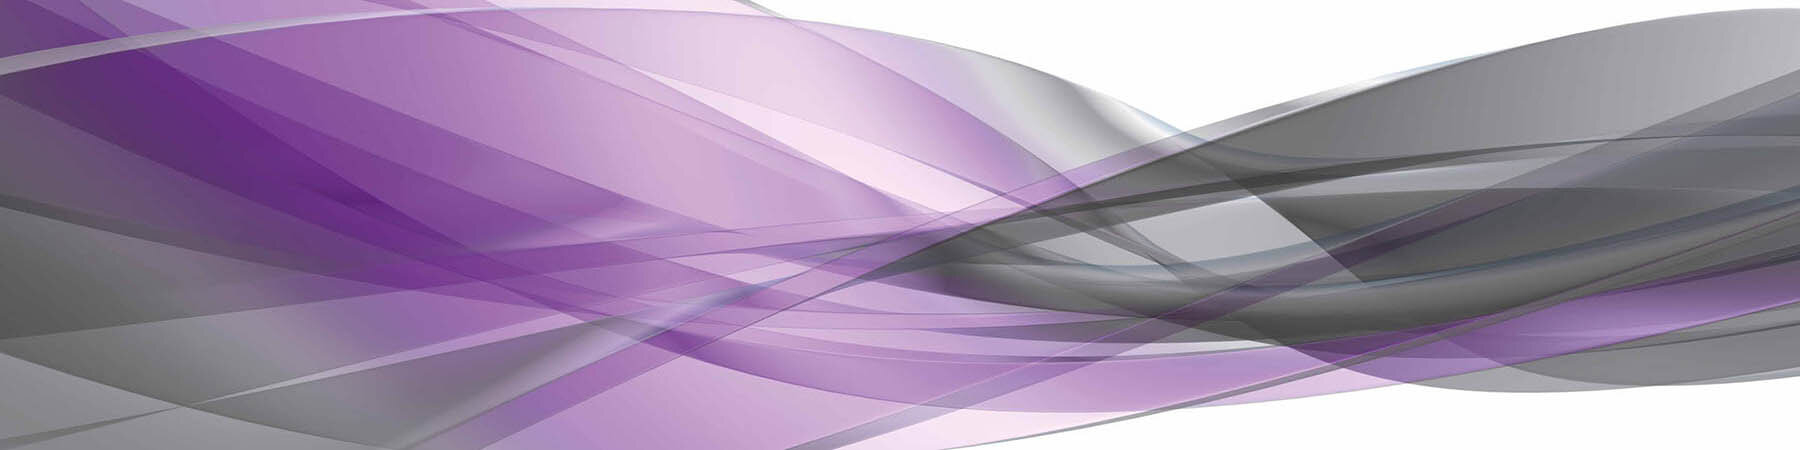 PlateART Küchenrückwand mit Motiv Welle Violett